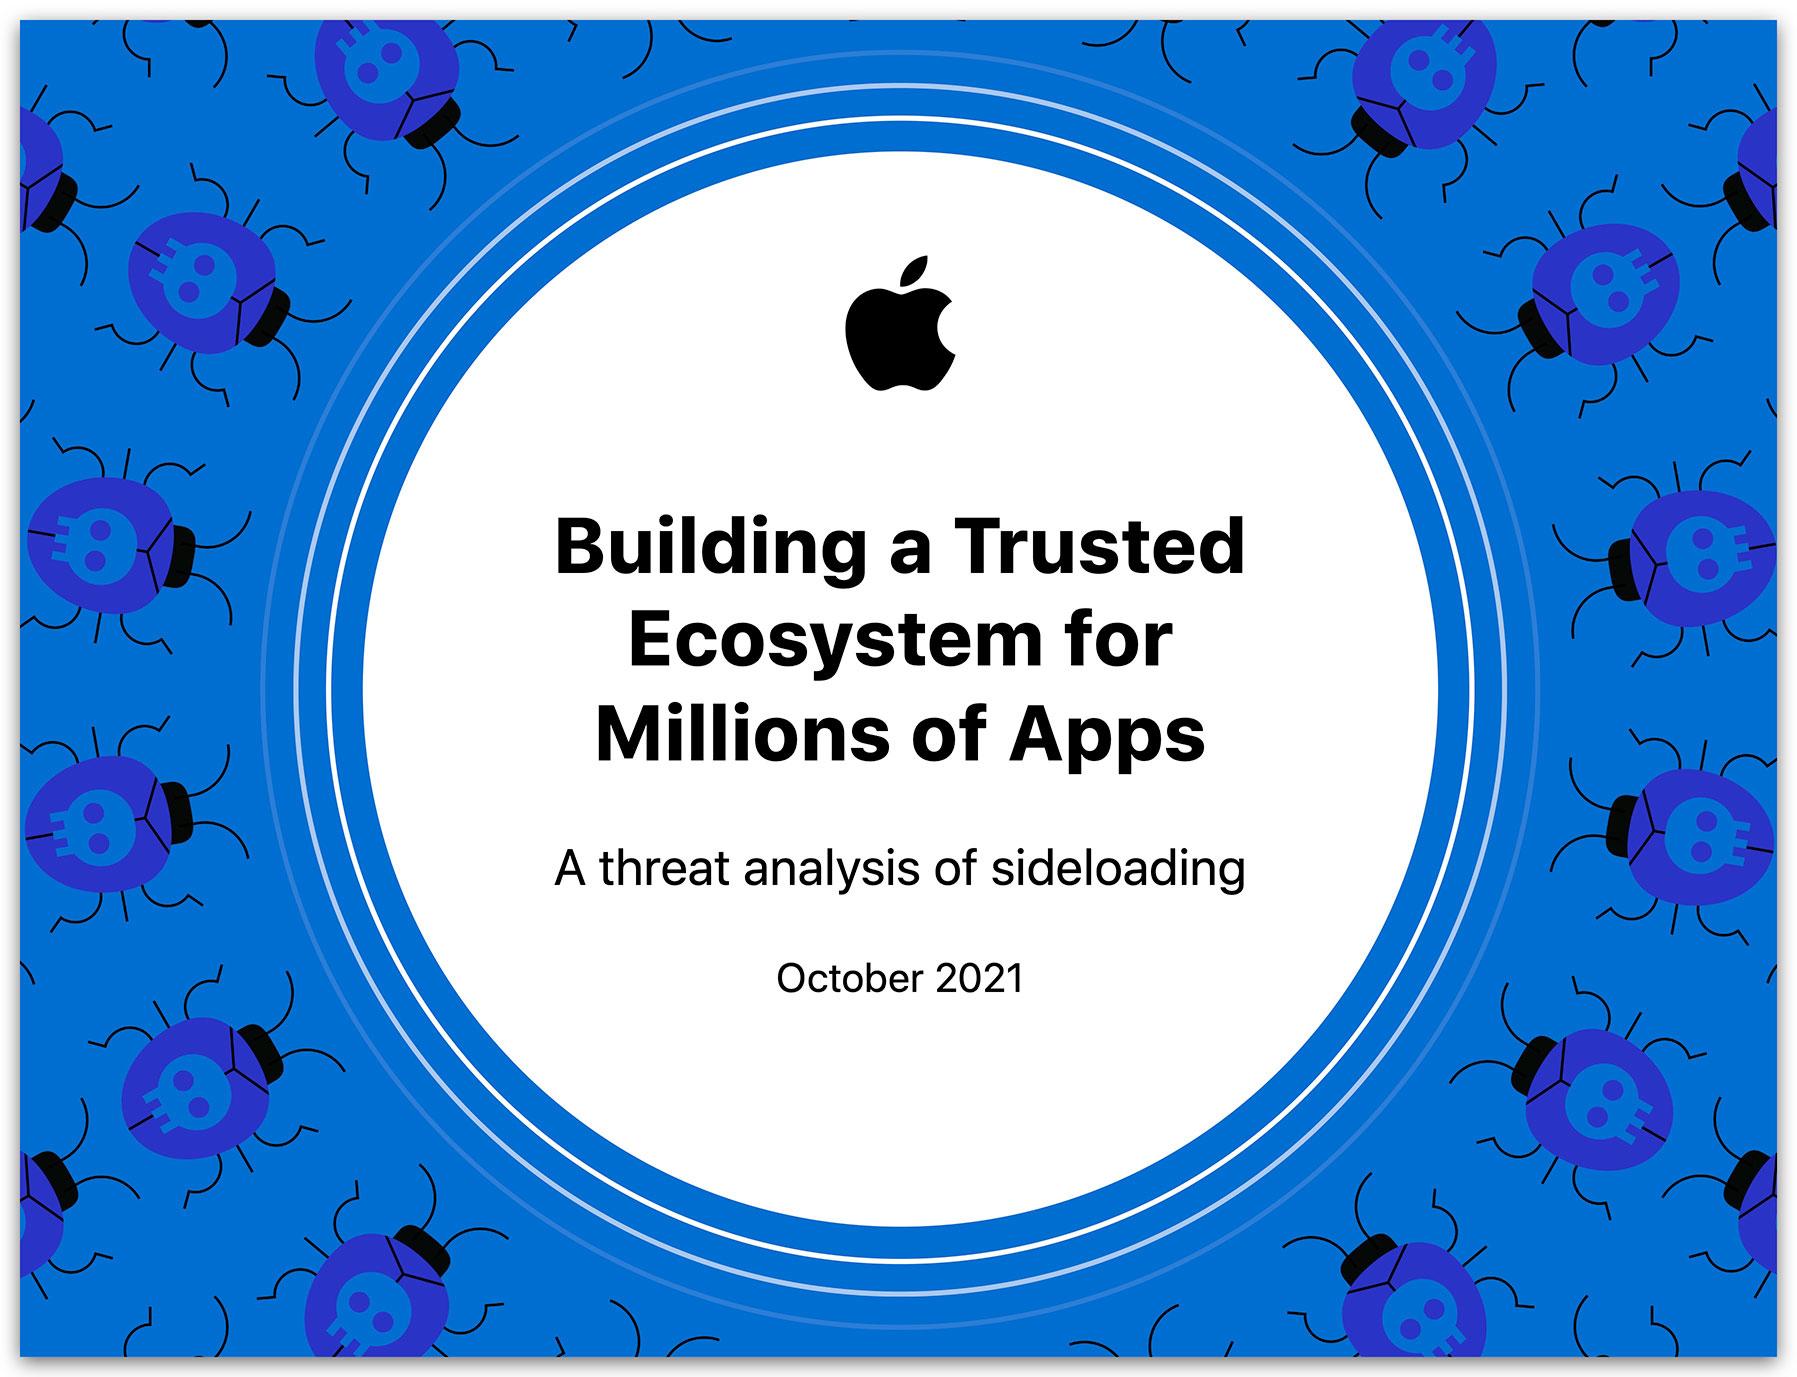 https://www.macfreak.nl/modules/news/images/zArt.BuildingATrustedEcosystemForMillionsOfApps.jpg